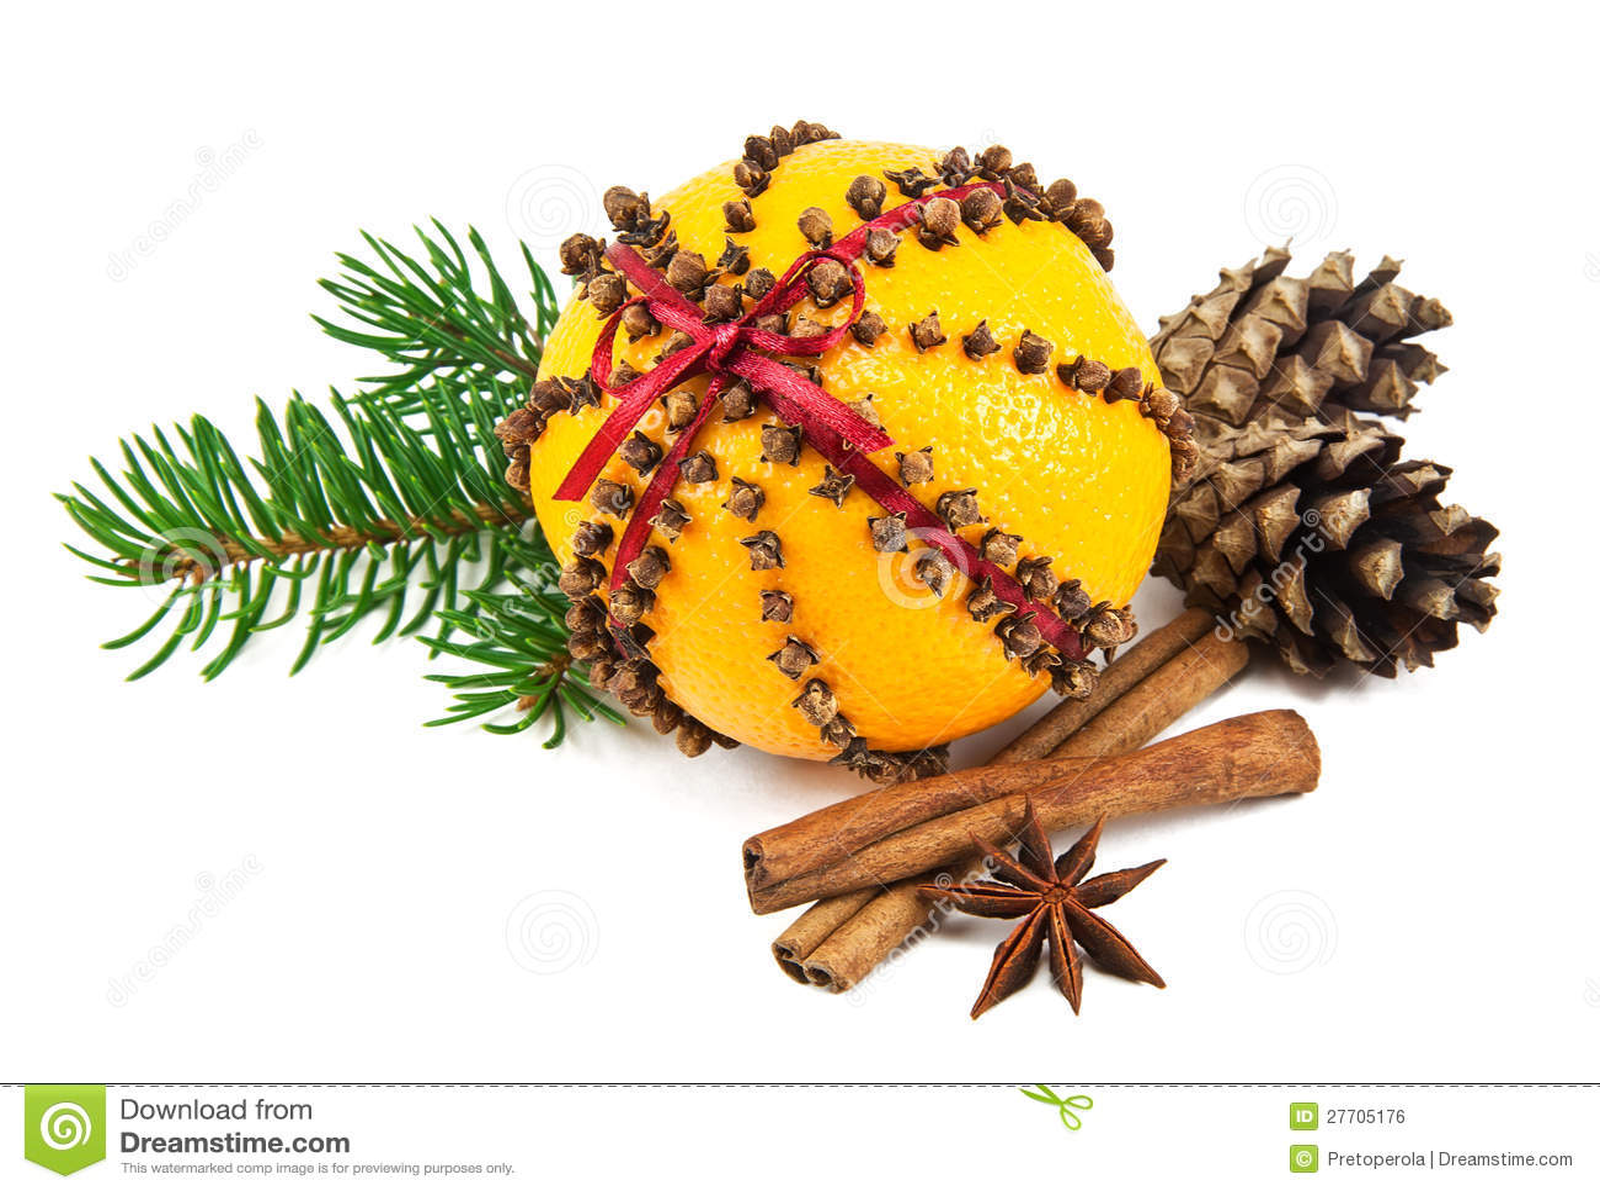 Christmas Clove And Orange Pomander Royalty Free Stock  : christmas clove orange pomander 27705176 from www.dreamstime.com size 1300 x 986 jpeg 176kB